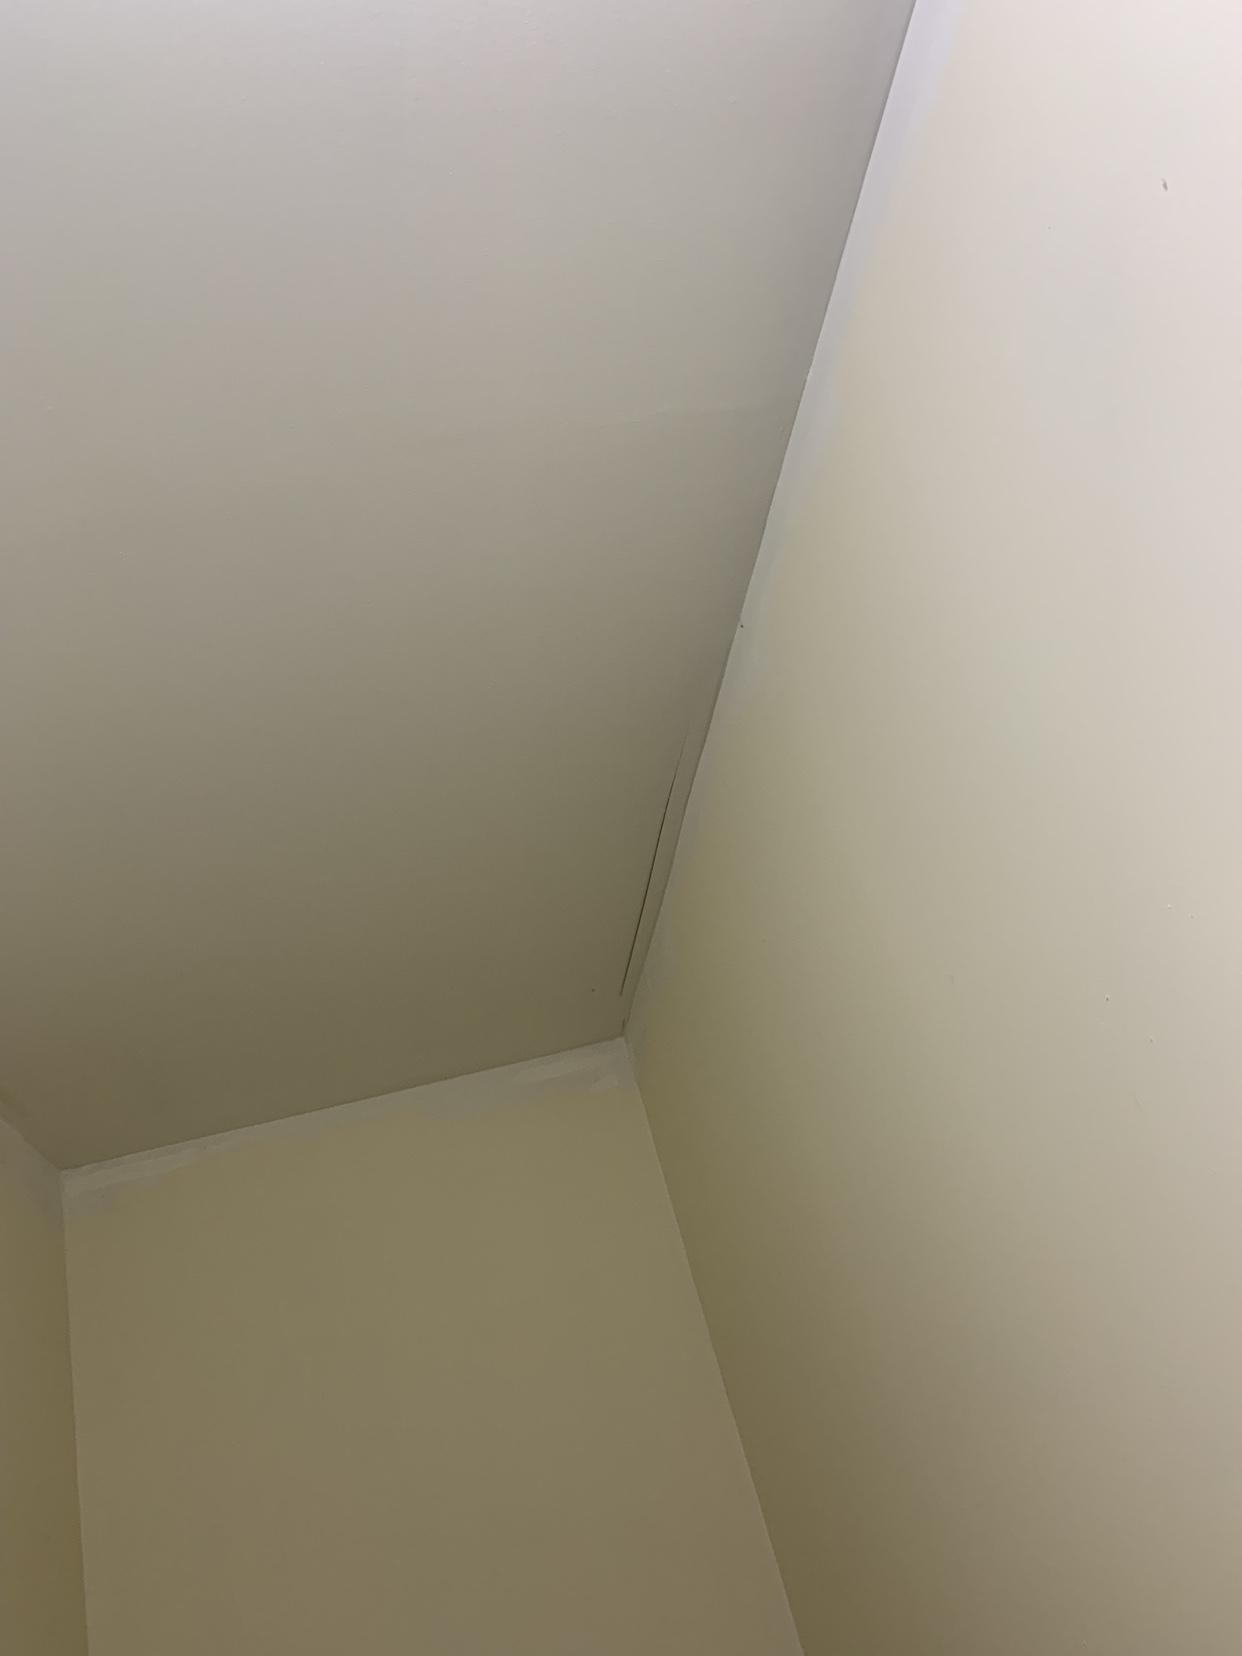 Drywall damage-img_2595.jpg